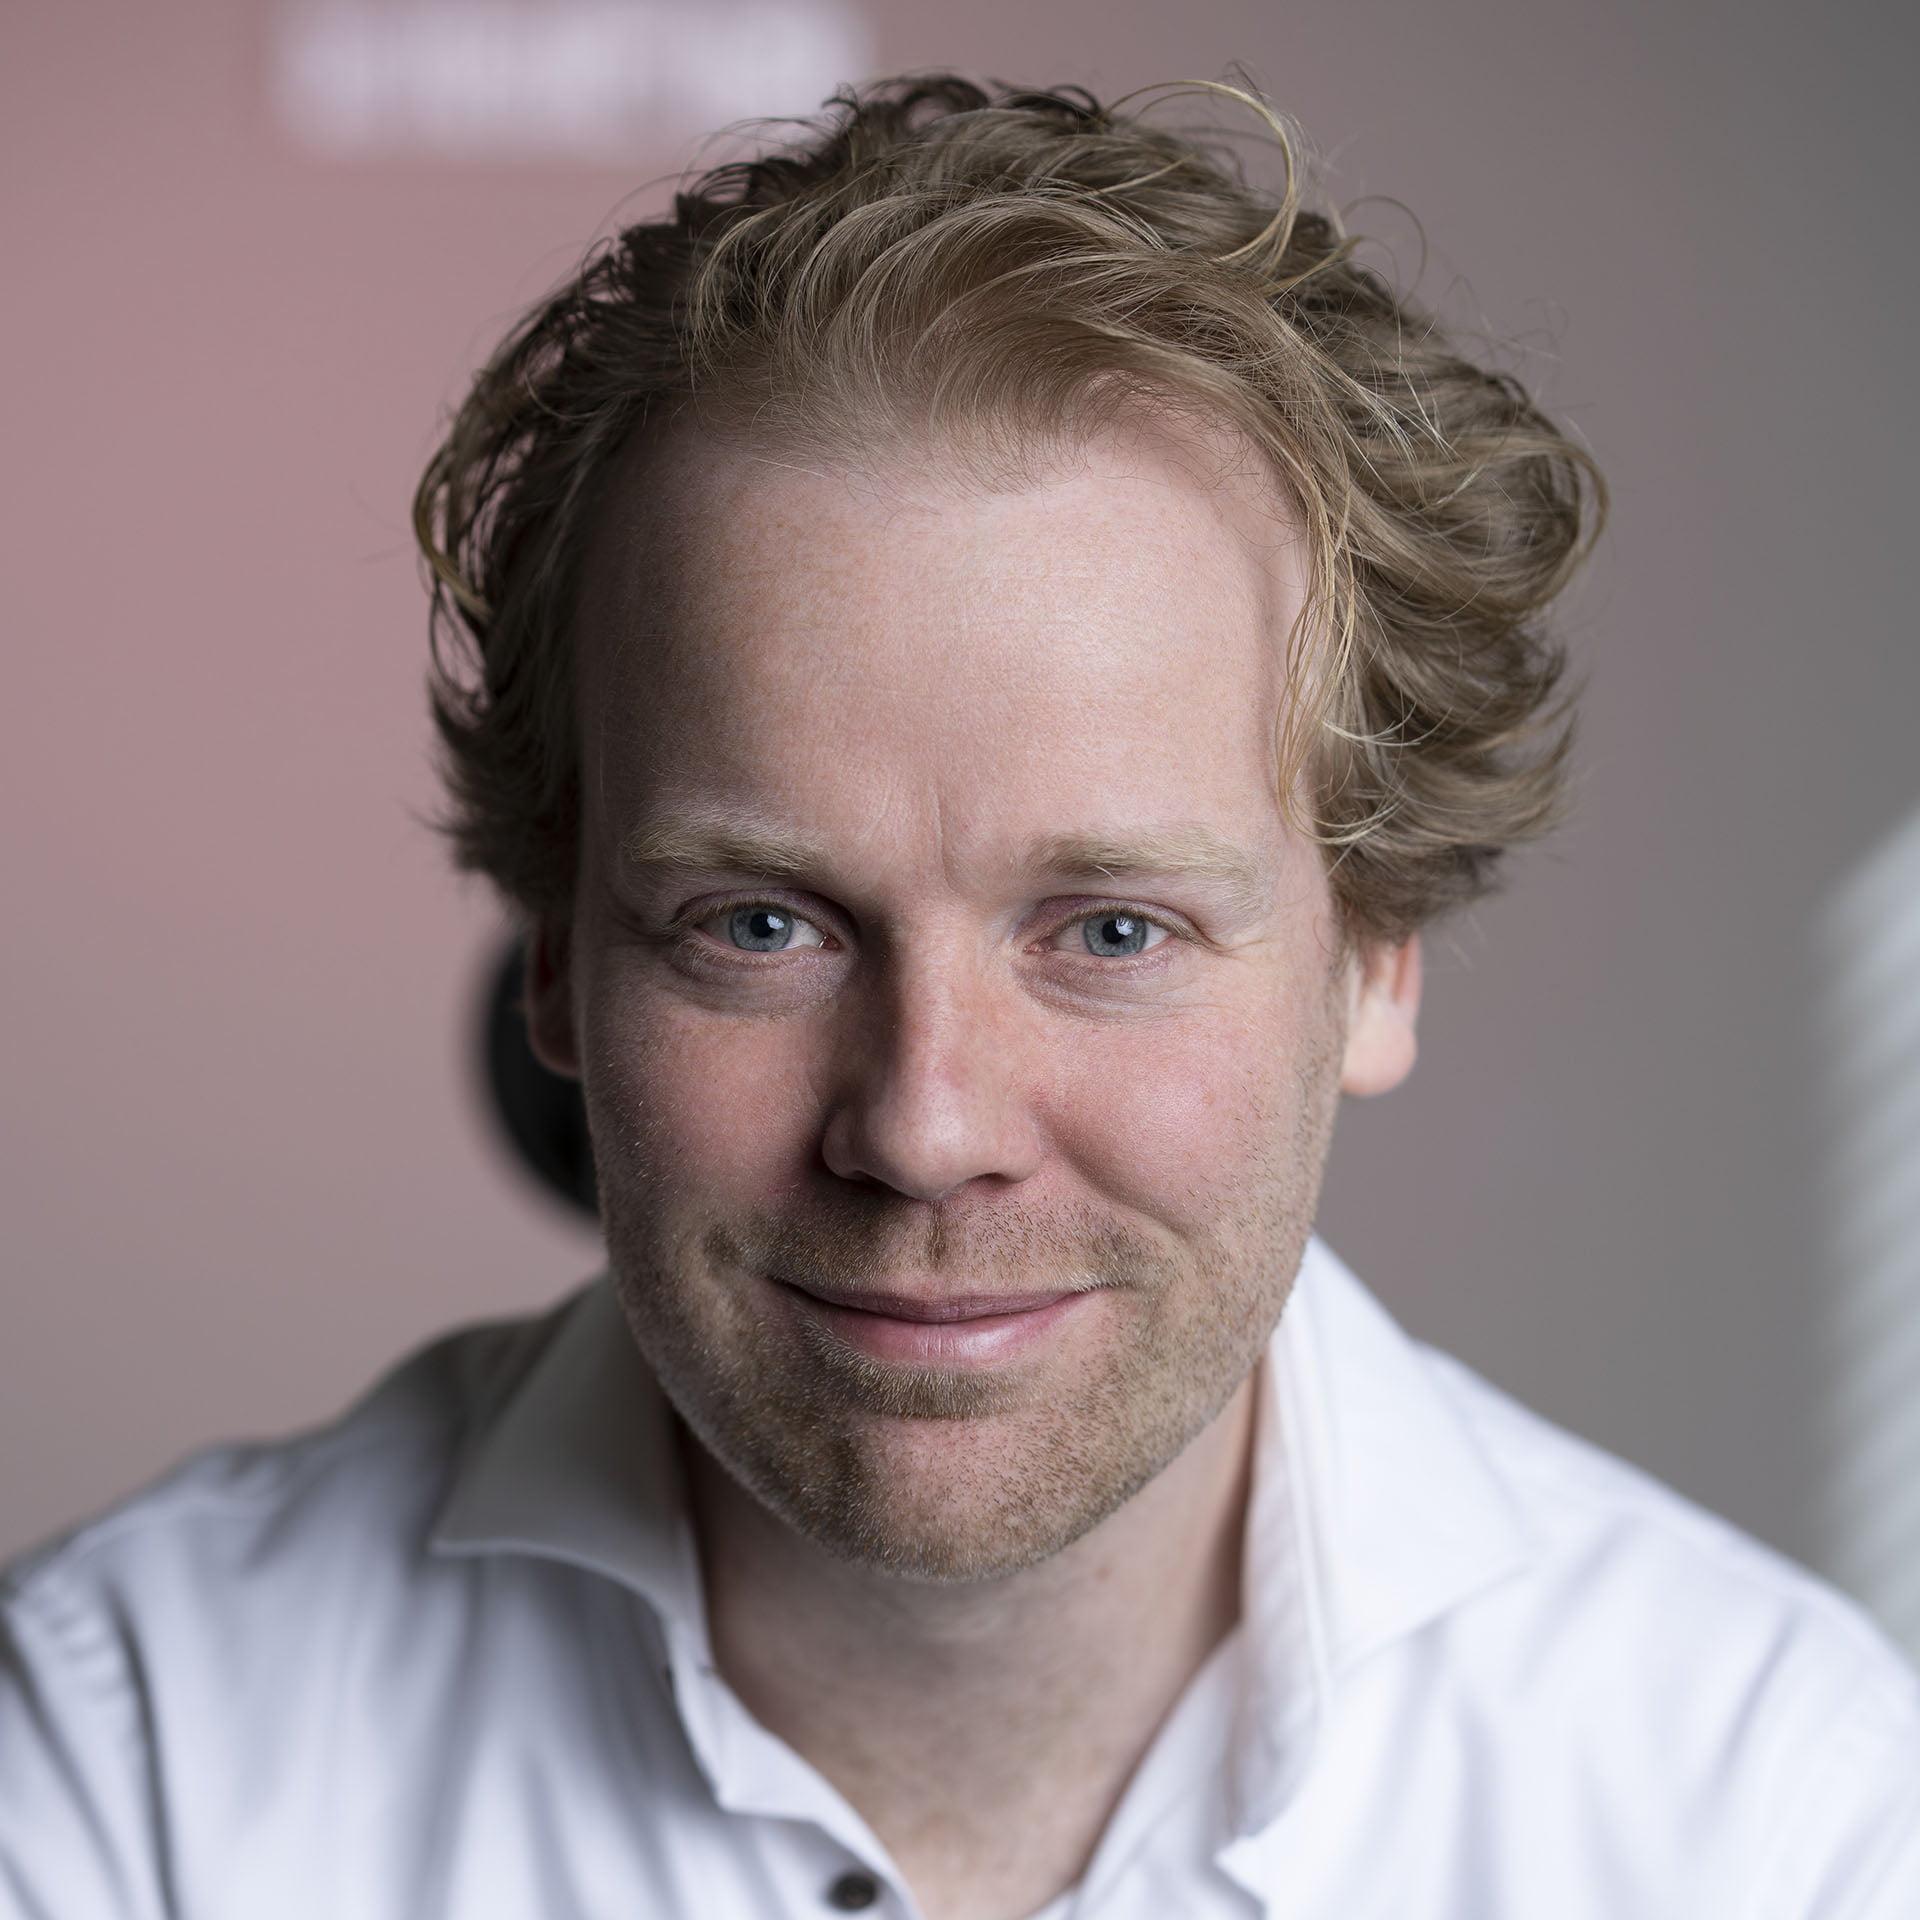 Vincent_Veenenberg_web profielfoto